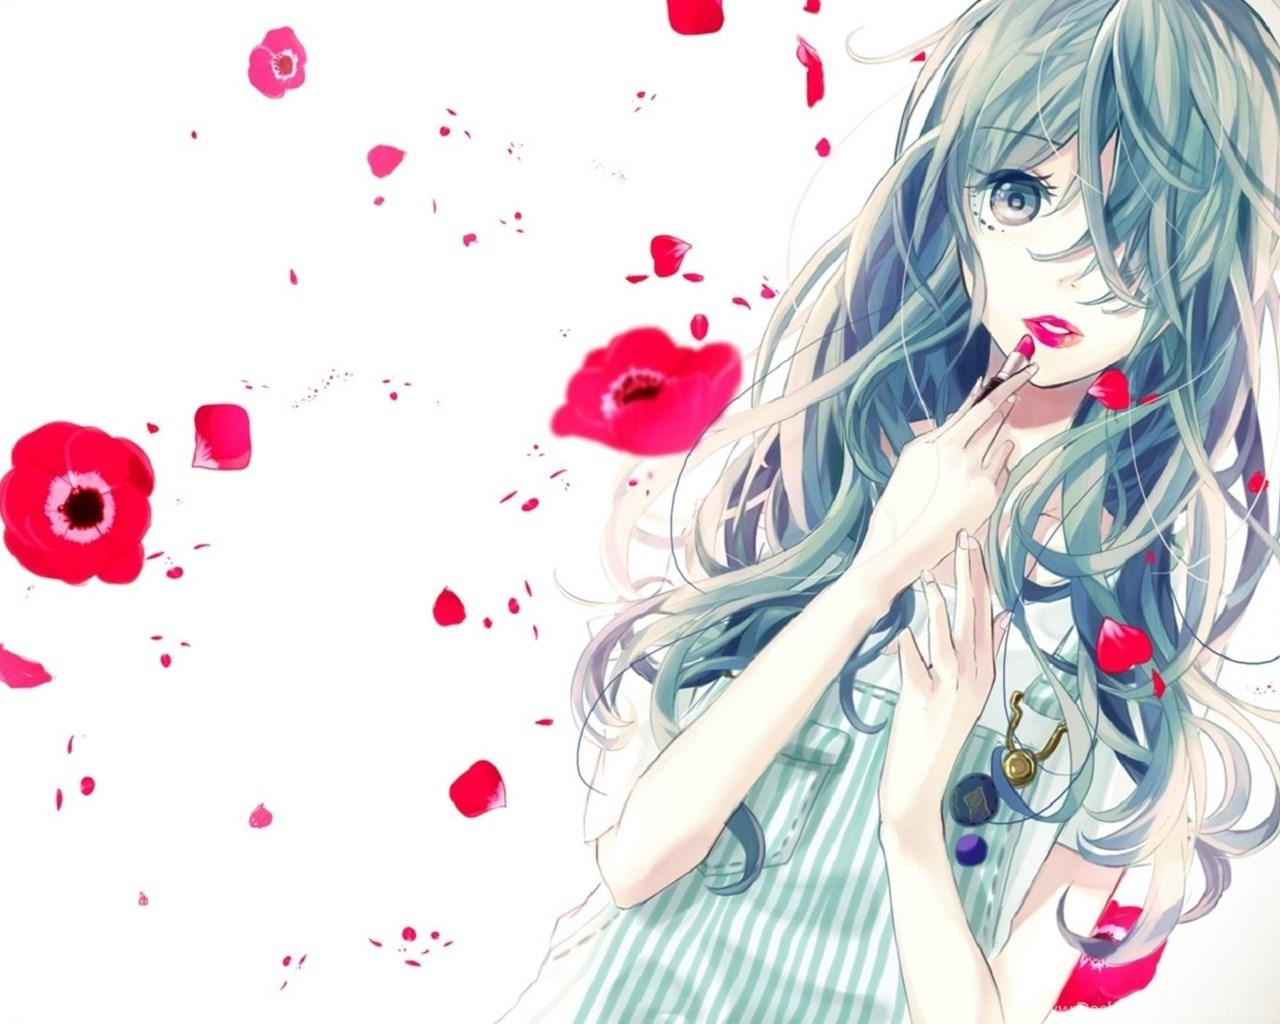 Girl: Cute Girly Wallpapers HD Wallpaper Images Desktop